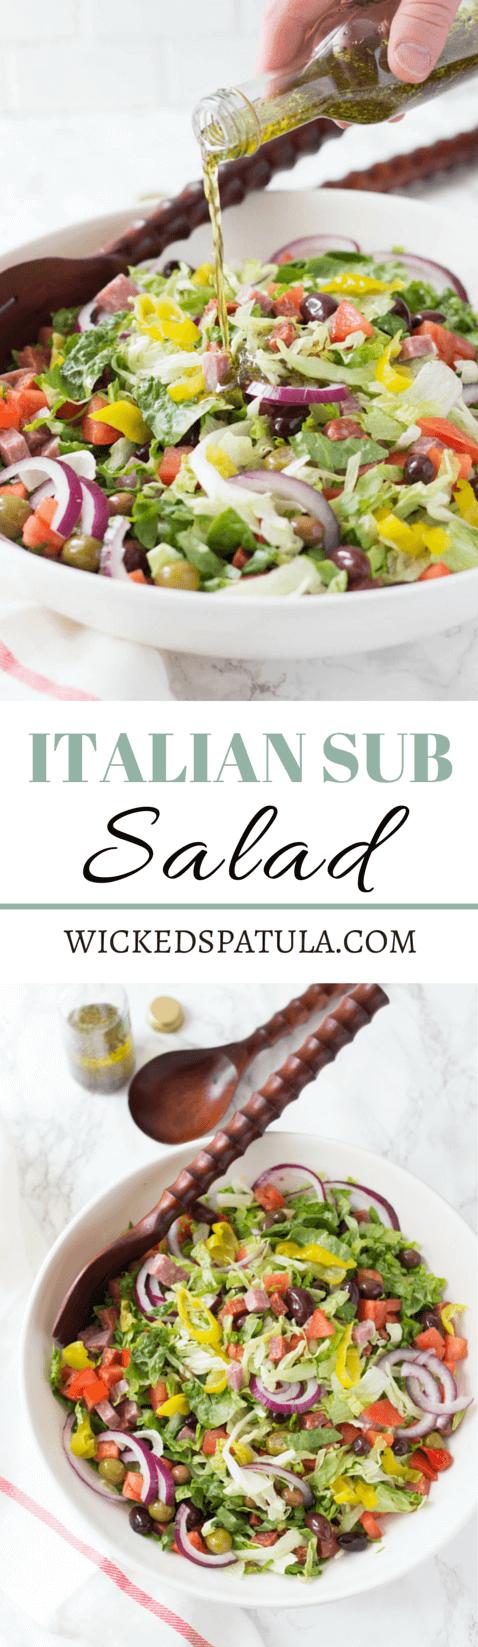 Italian Sub Salad – Wicked Spatula